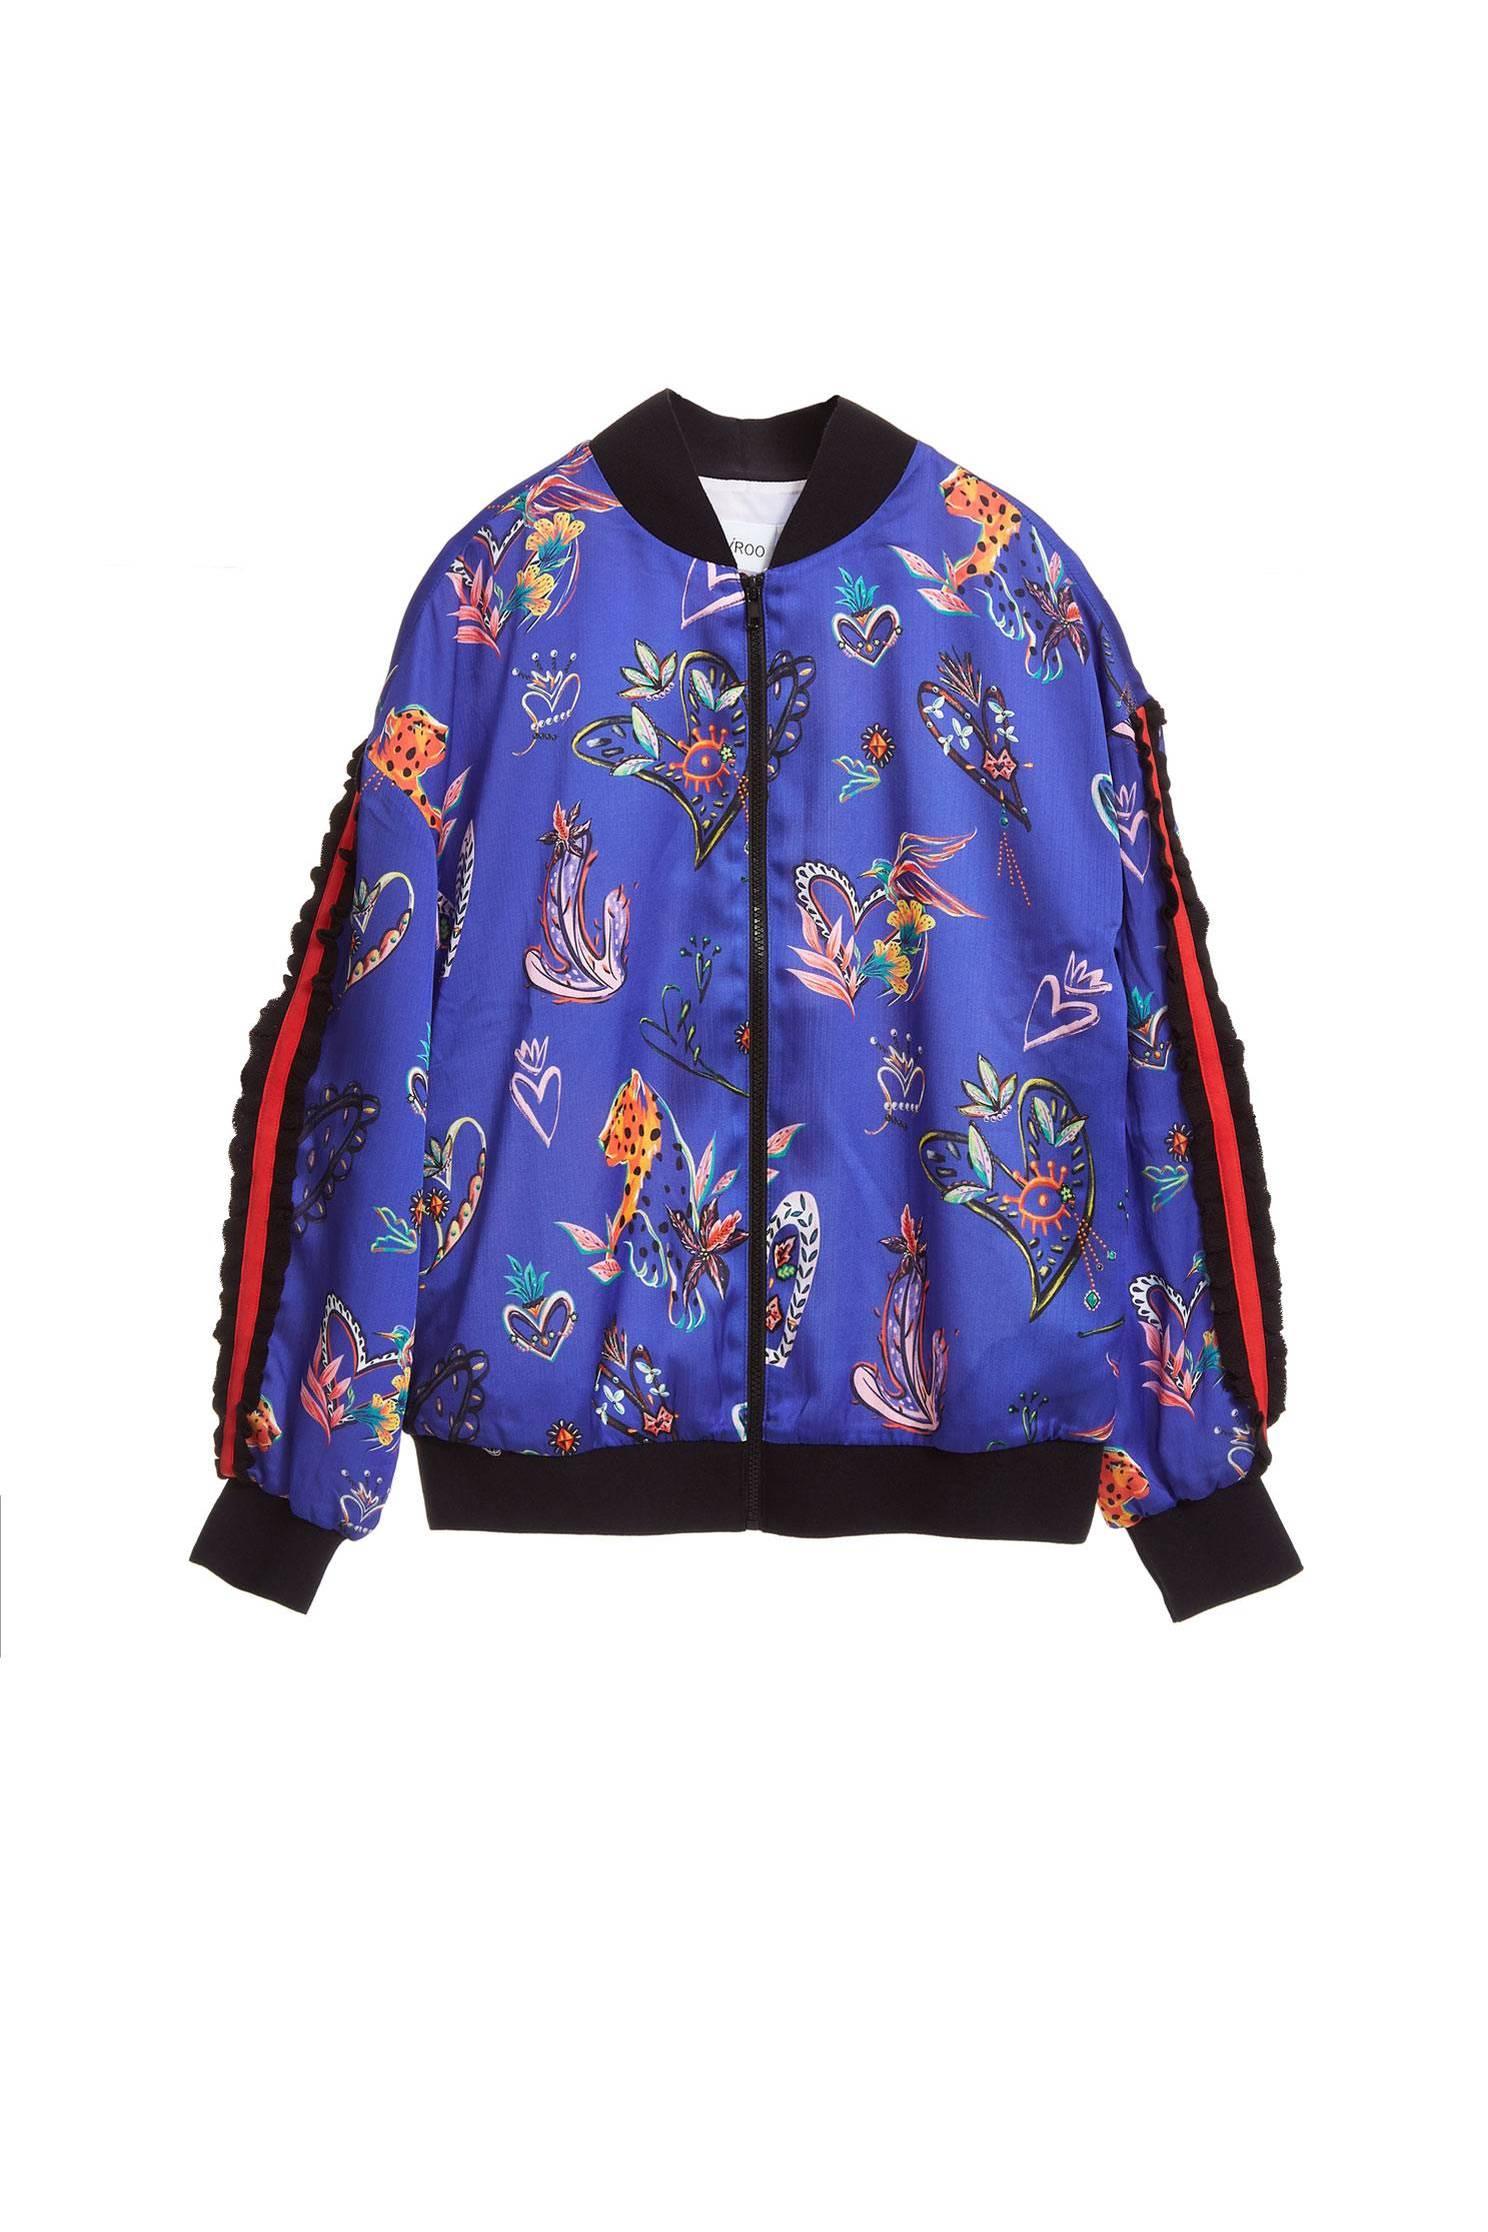 Full totem design jacket